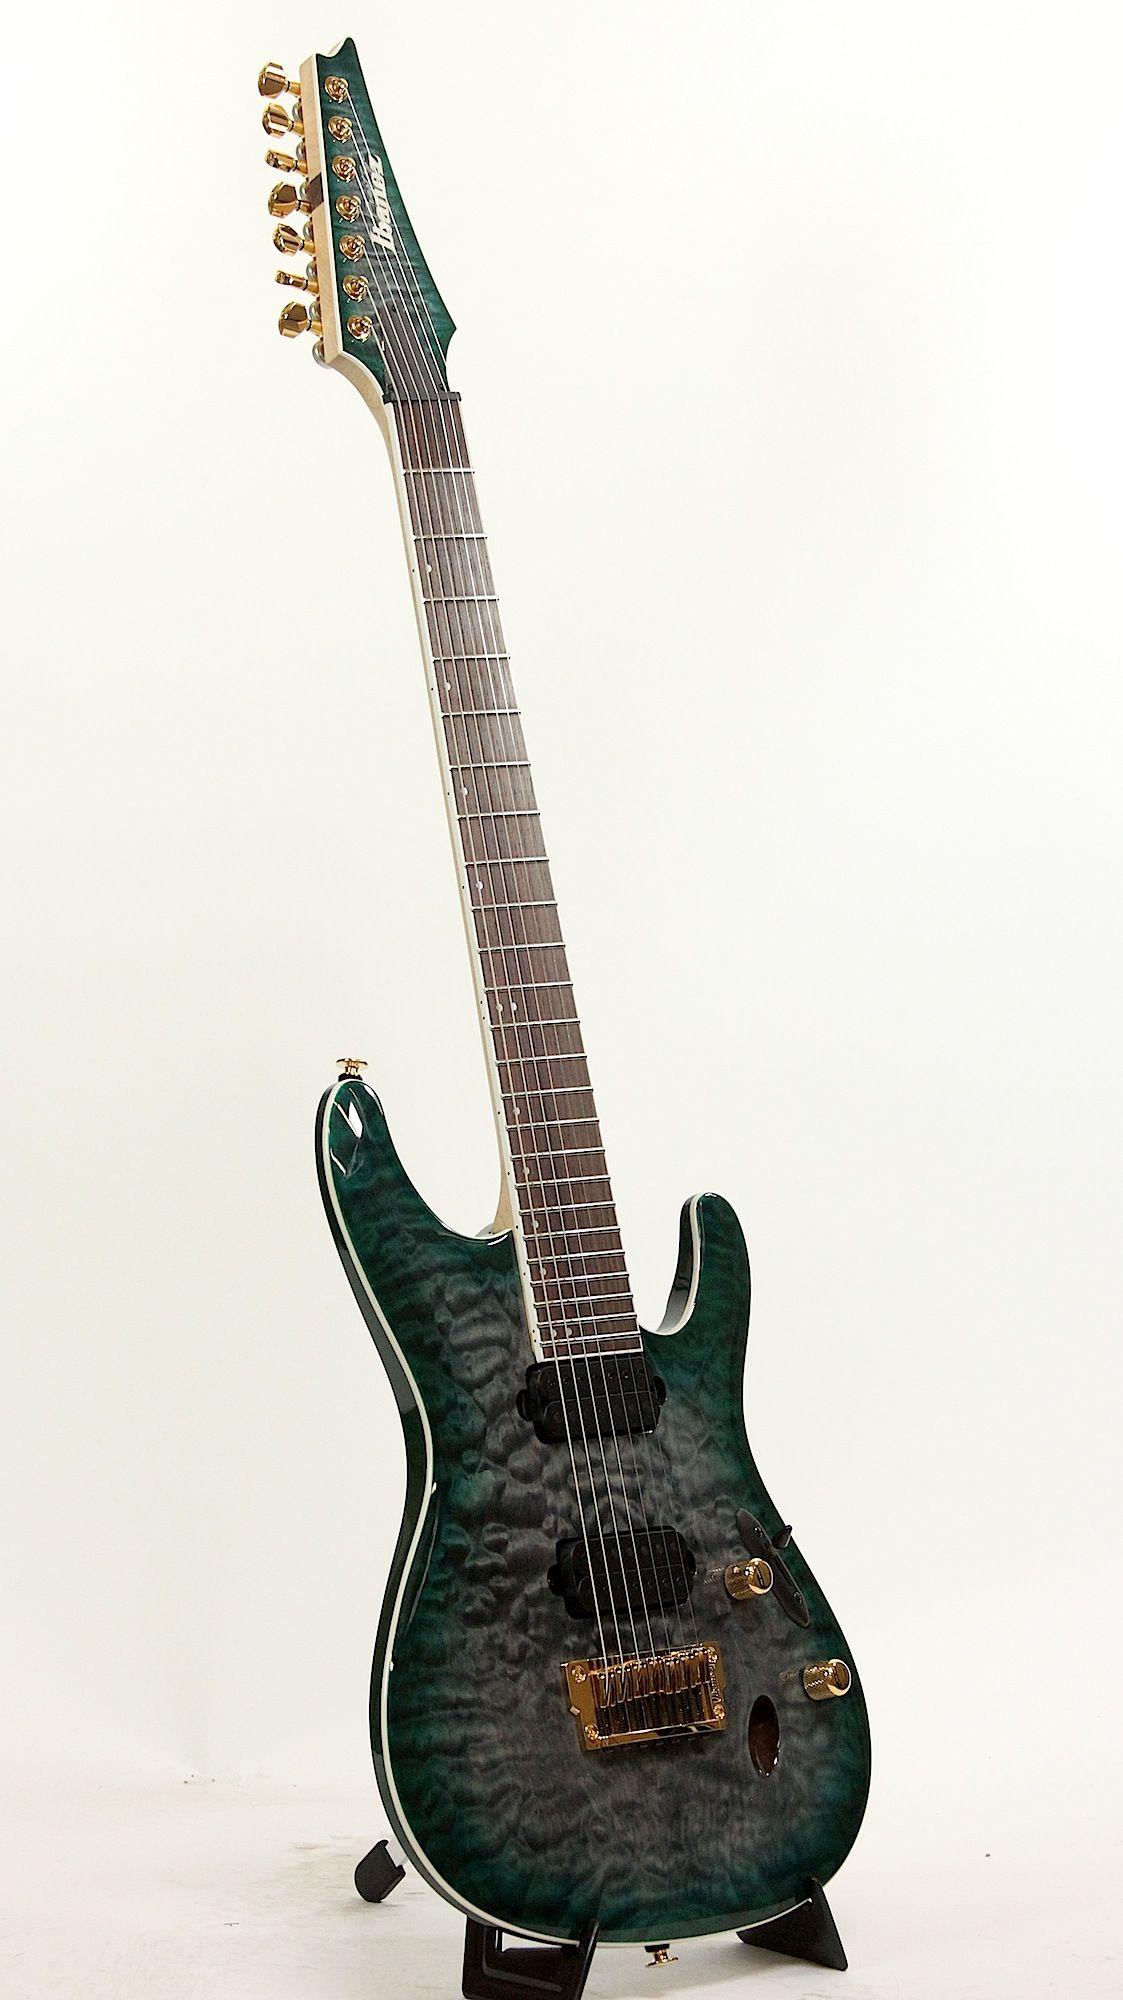 Ibanez S5527qfx Dgd Dark Green Doom Burst 7 String Electric Guitar